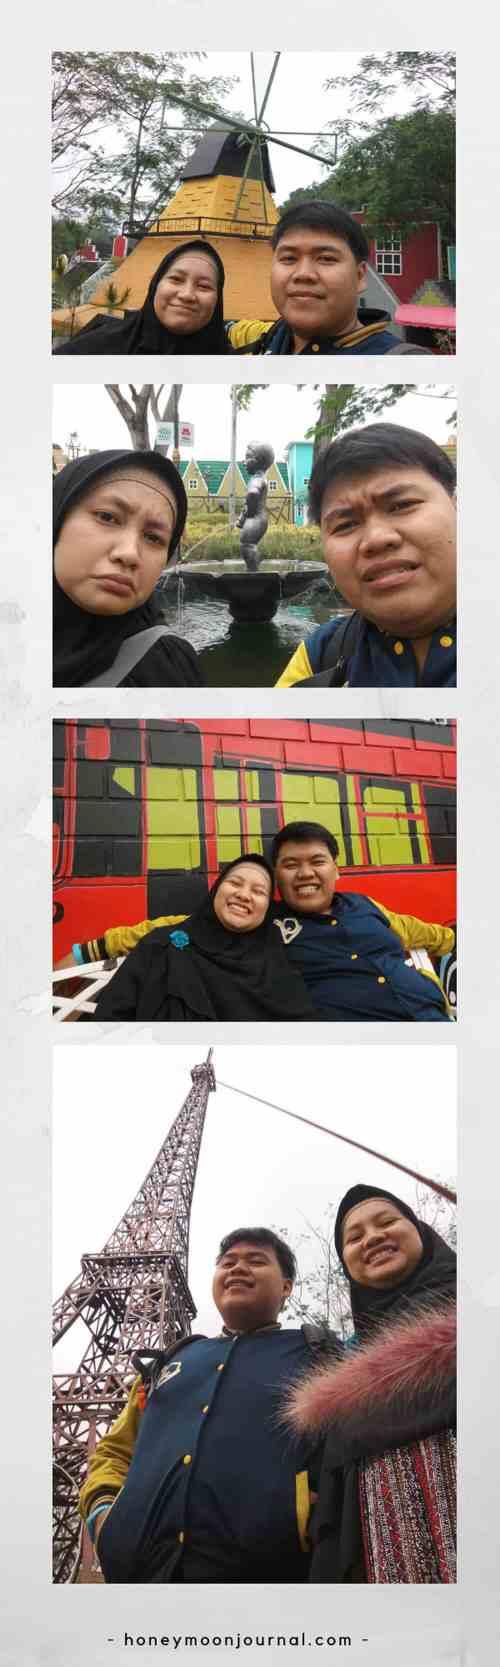 devoyage bogor trimester kedua kehamilan kabay honeymoonjournal.com